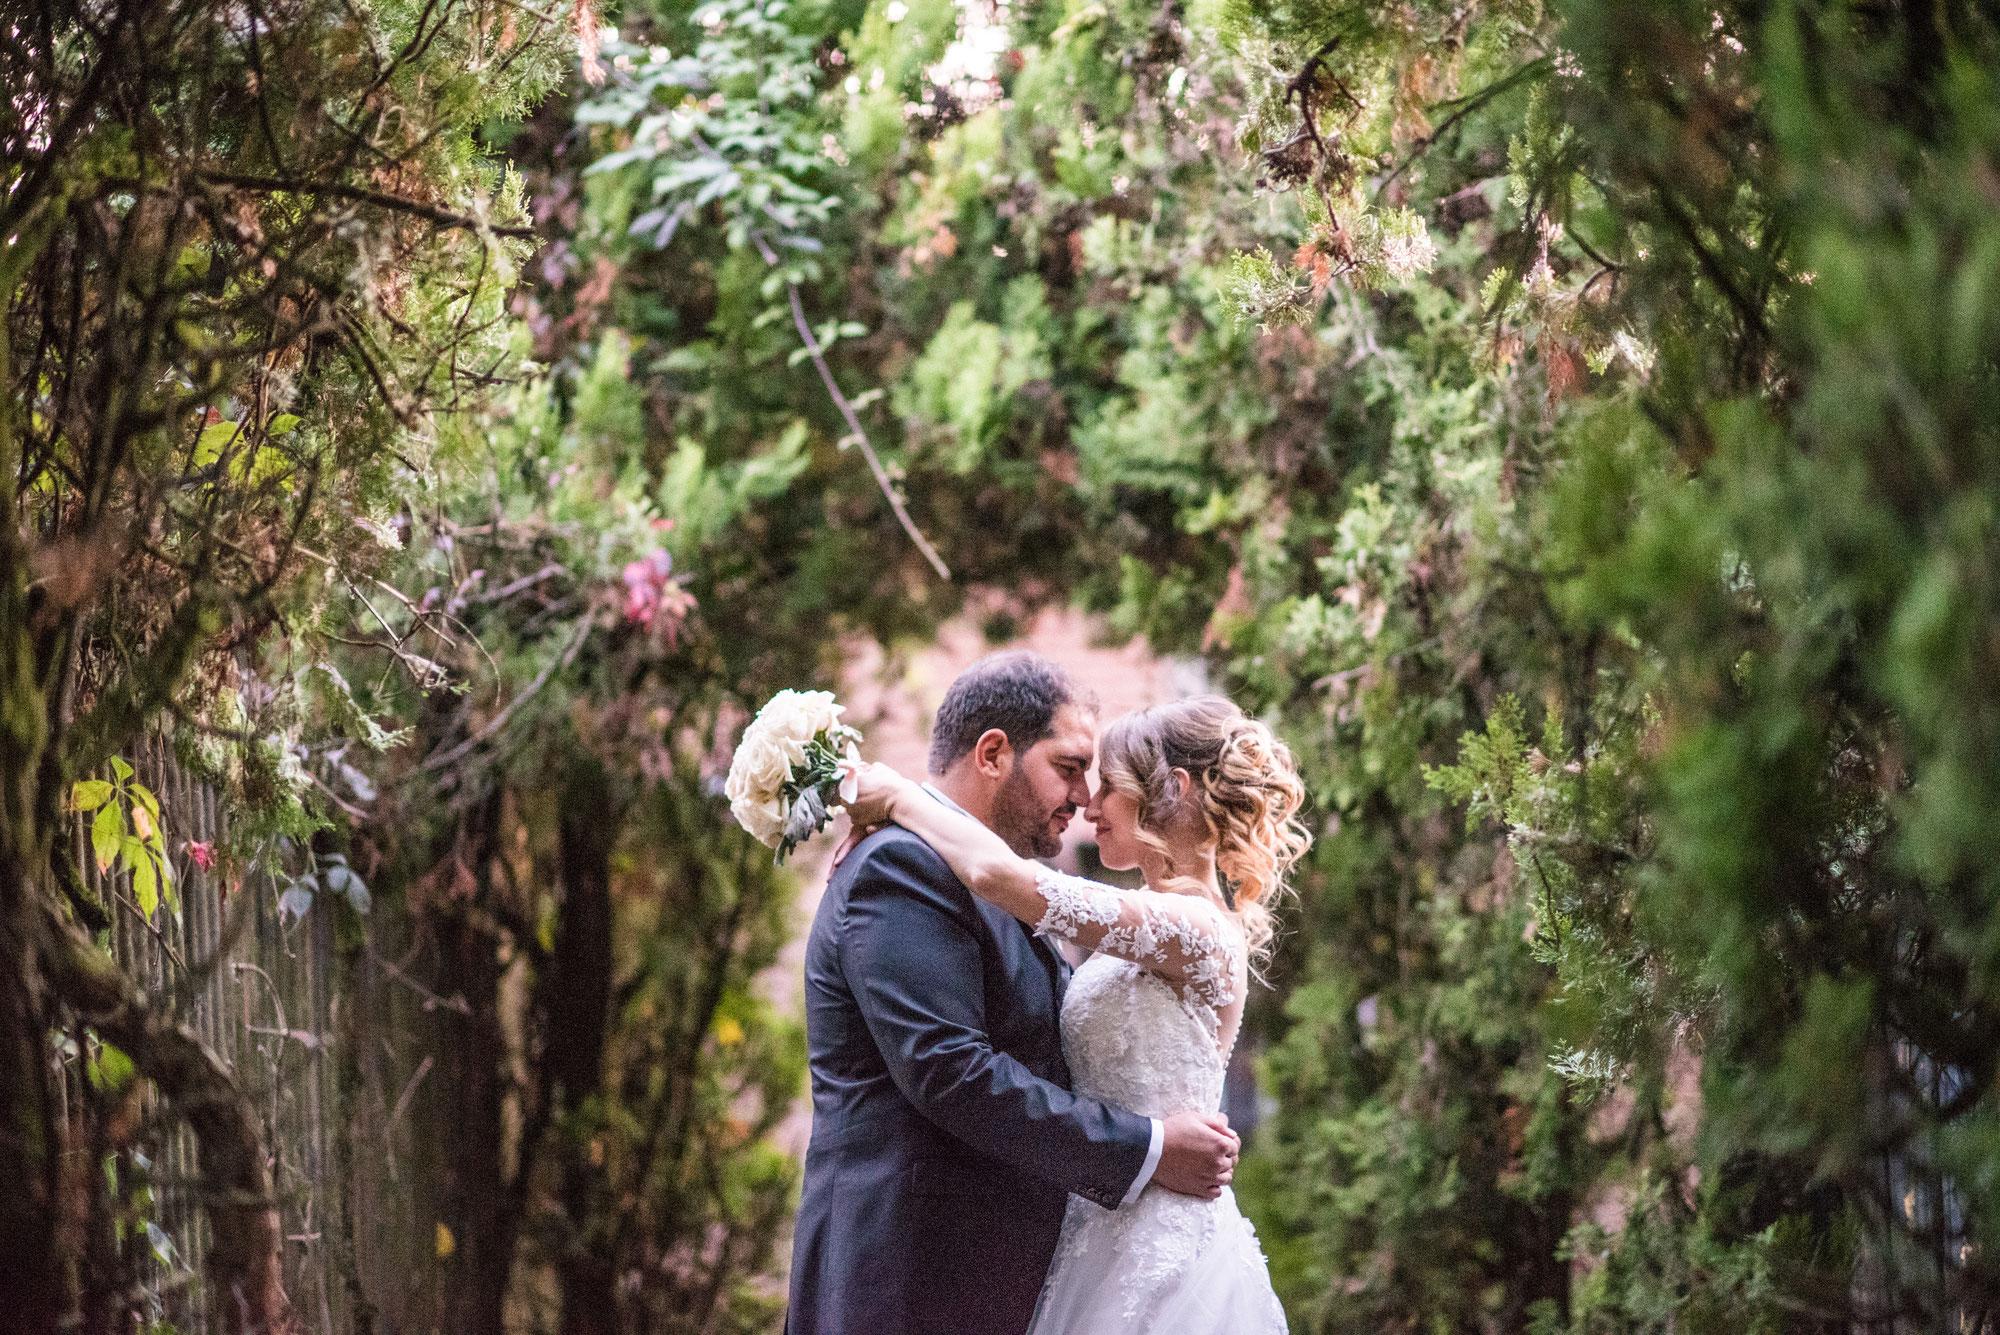 Matrimonio Tenuta Il Tenchio - Matrimonio Erika e Gregorio